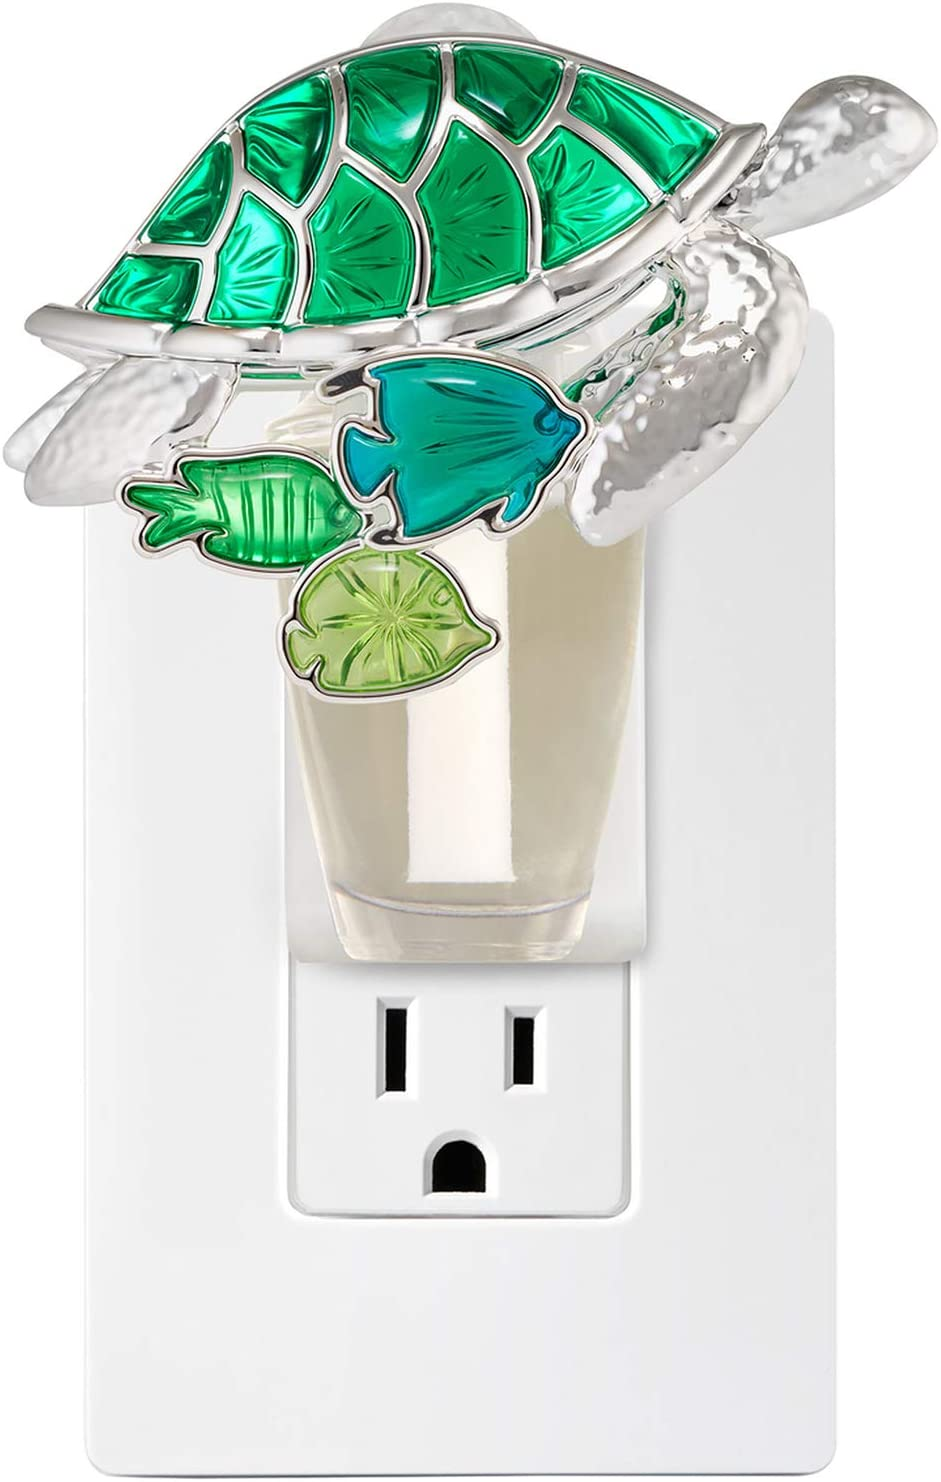 Bath and Body Works Turtle and Fish NIGHTLIGHT Wallflowers Fragrance Plug